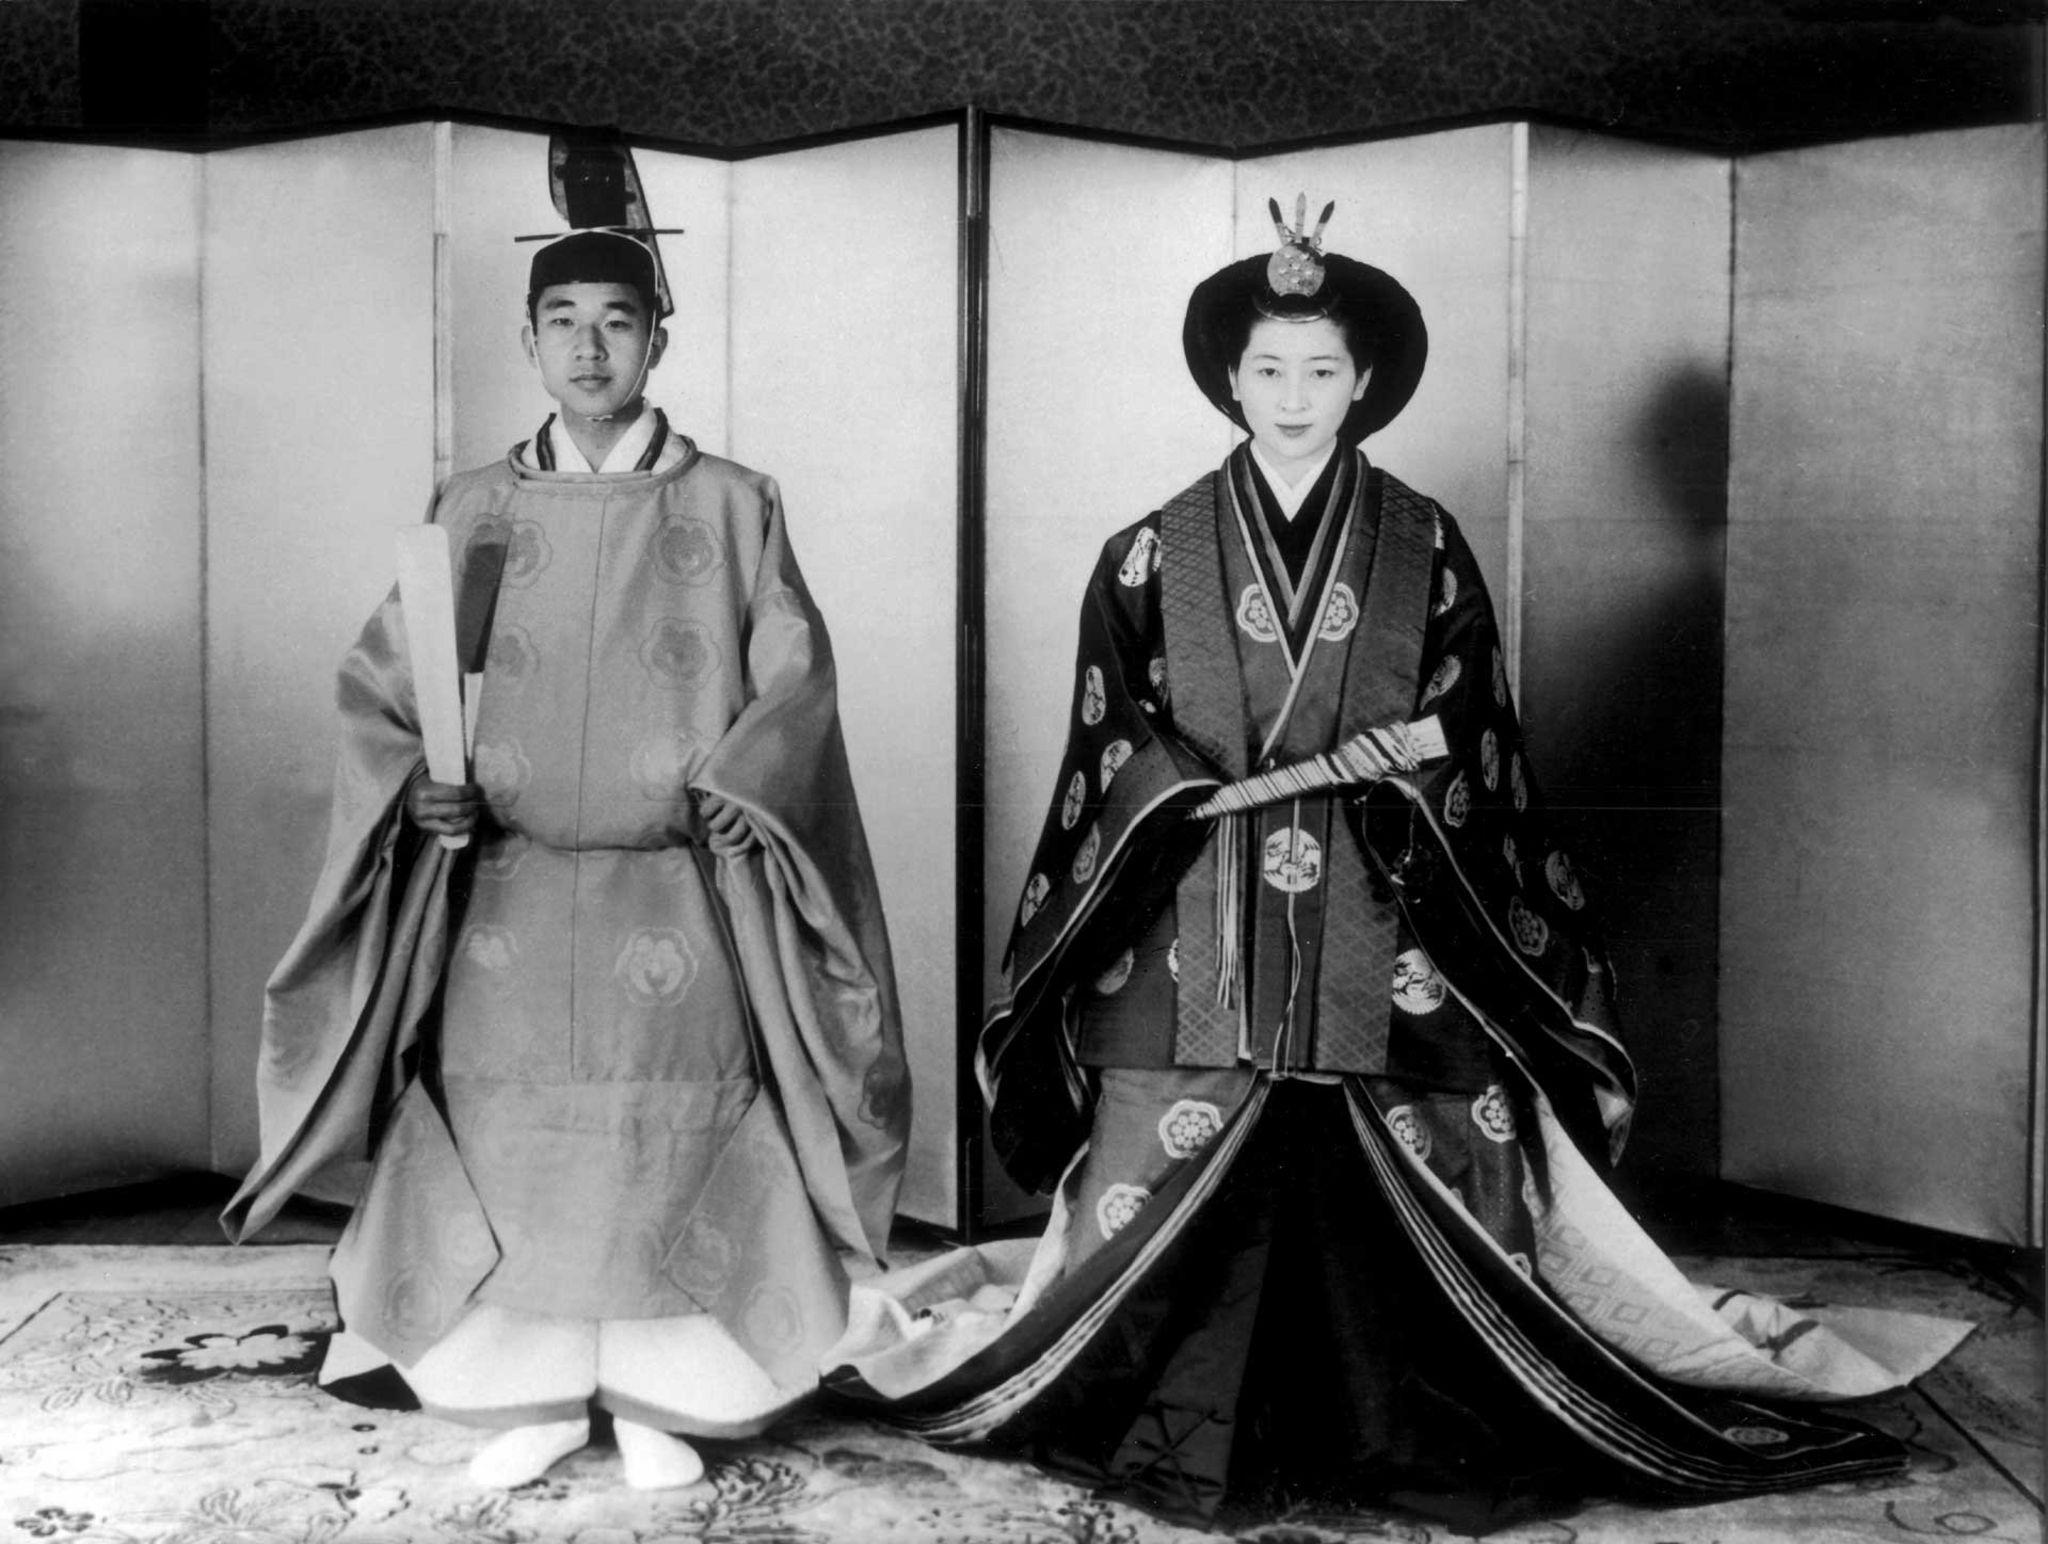 Wedding of Prince Akihito and Princess Michiko, 1959.